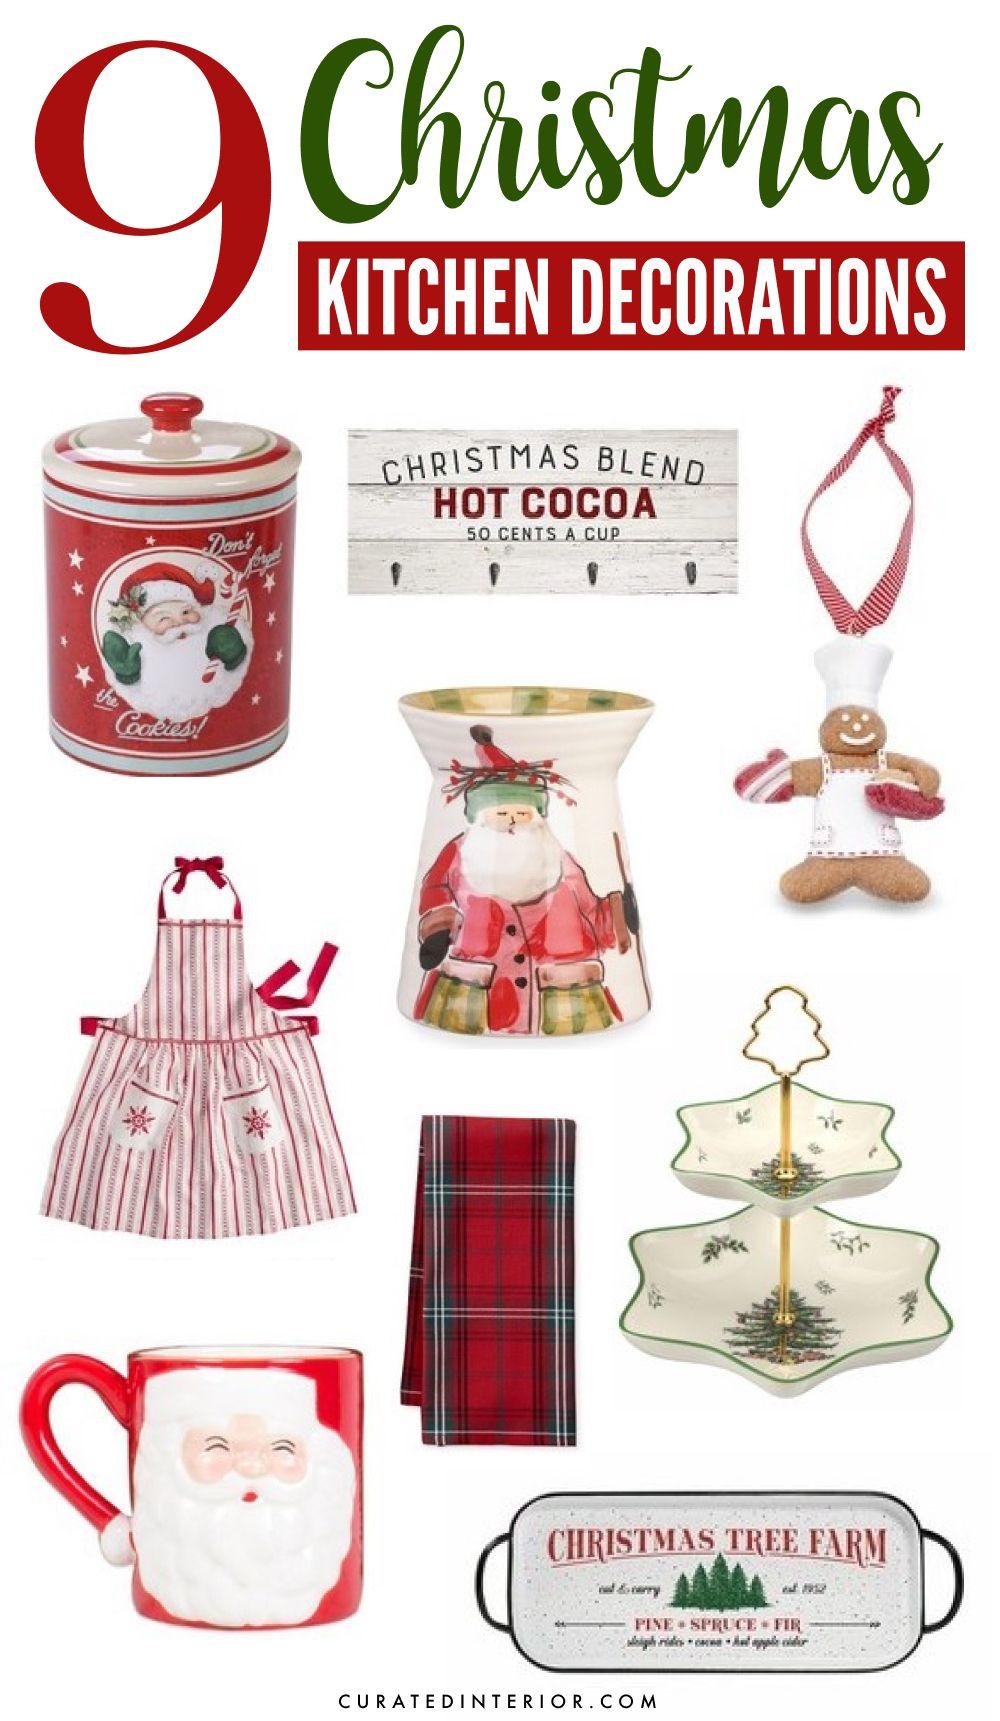 9 Christmas Kitchen Decorations